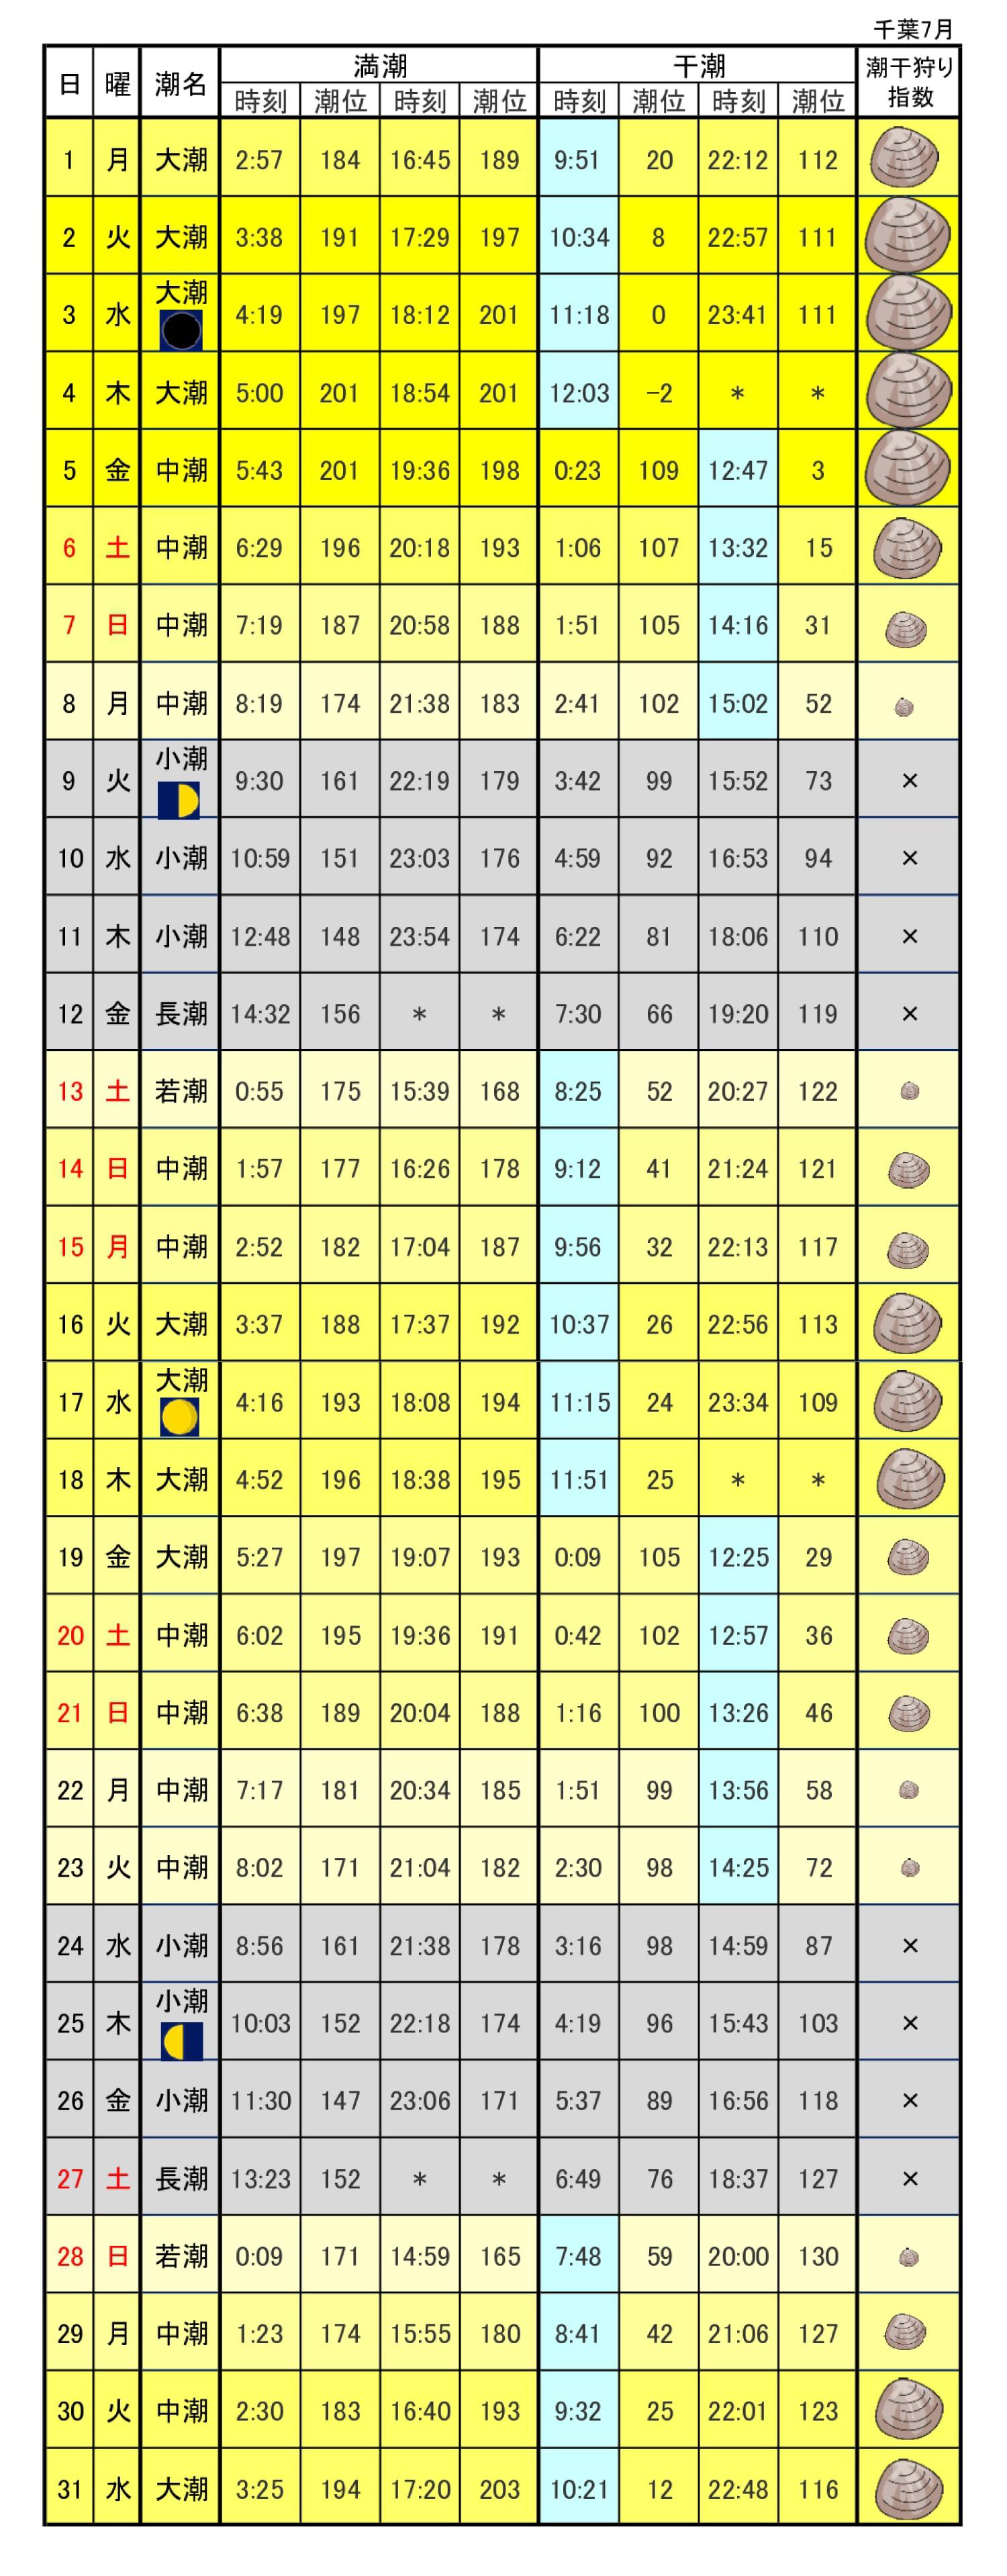 千葉県東京湾潮干狩り潮見表2019年7月